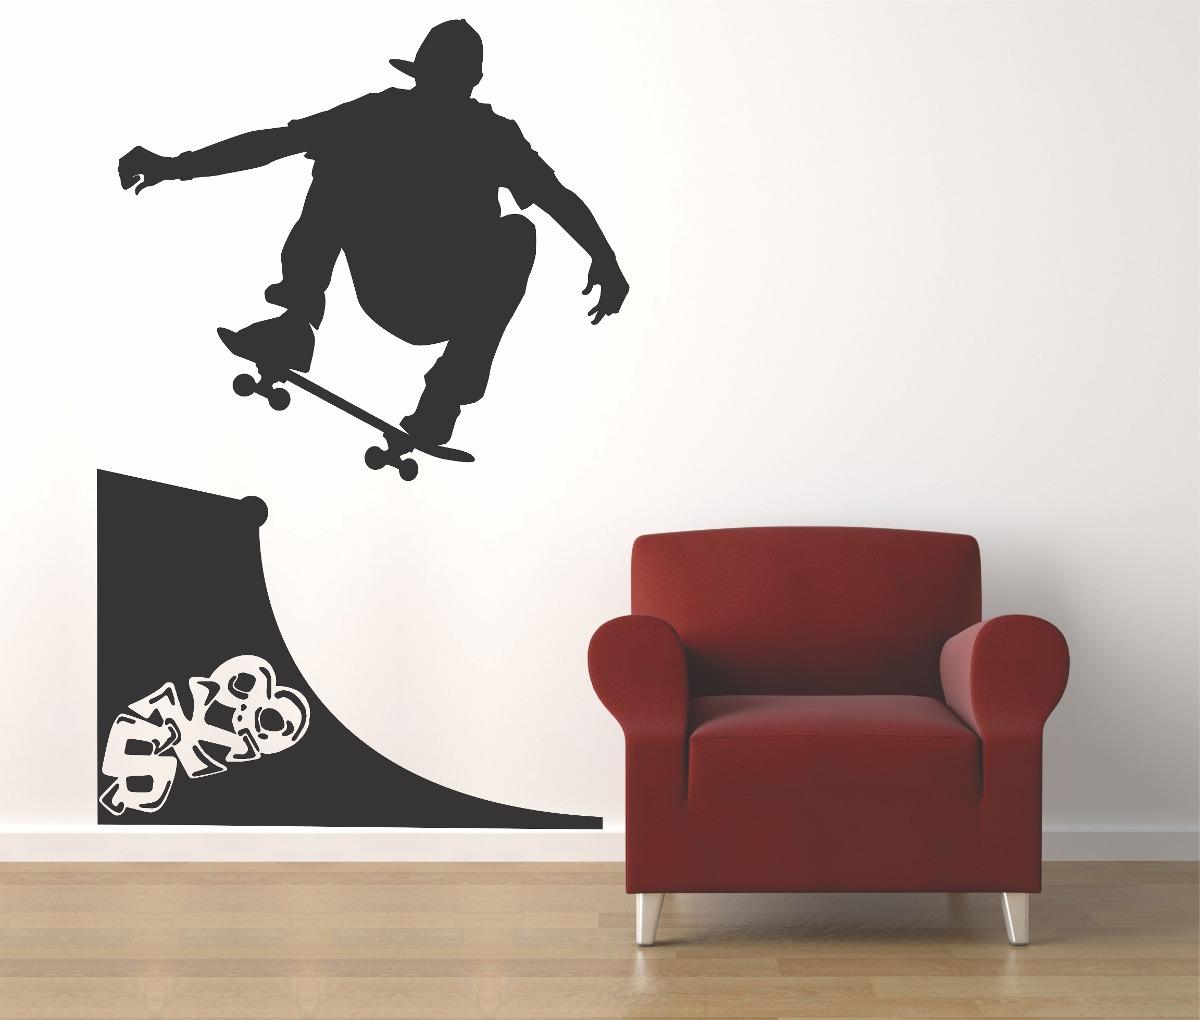 8a4a68c48931b Adesivo Parede Skate Rampa 1